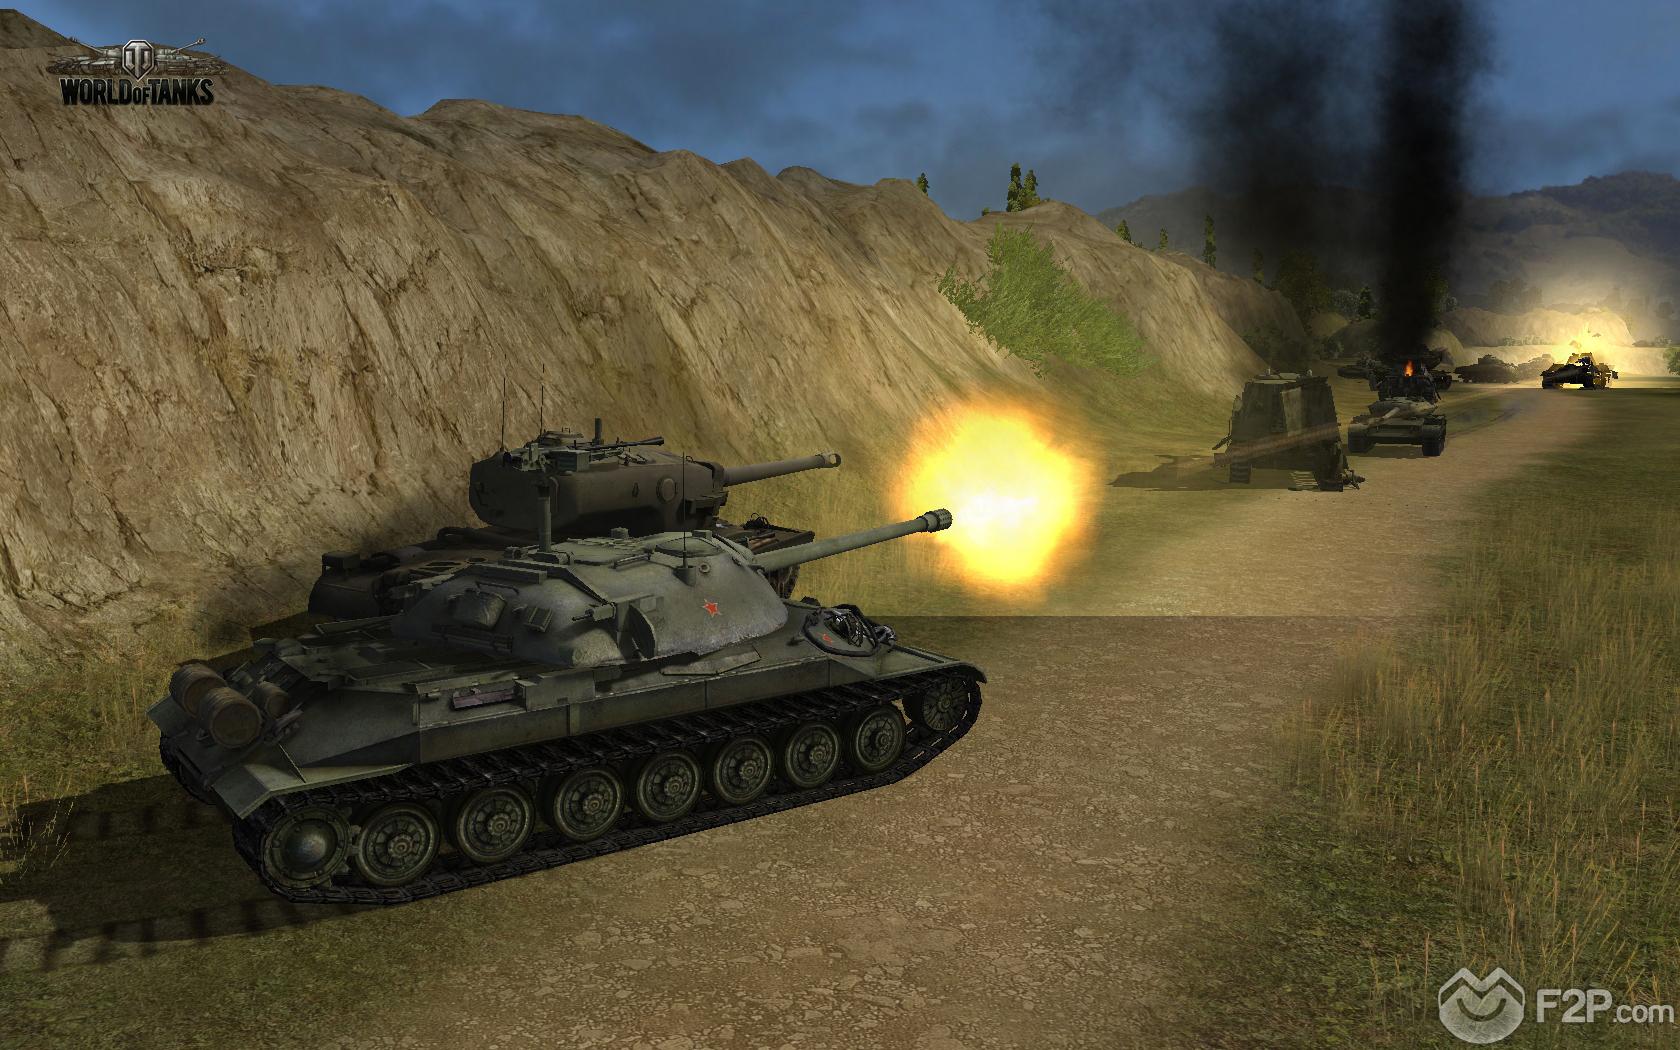 Click image for larger version.Name:World of Tanks 53.jpgViews:137Size:1.37 MBID:3845